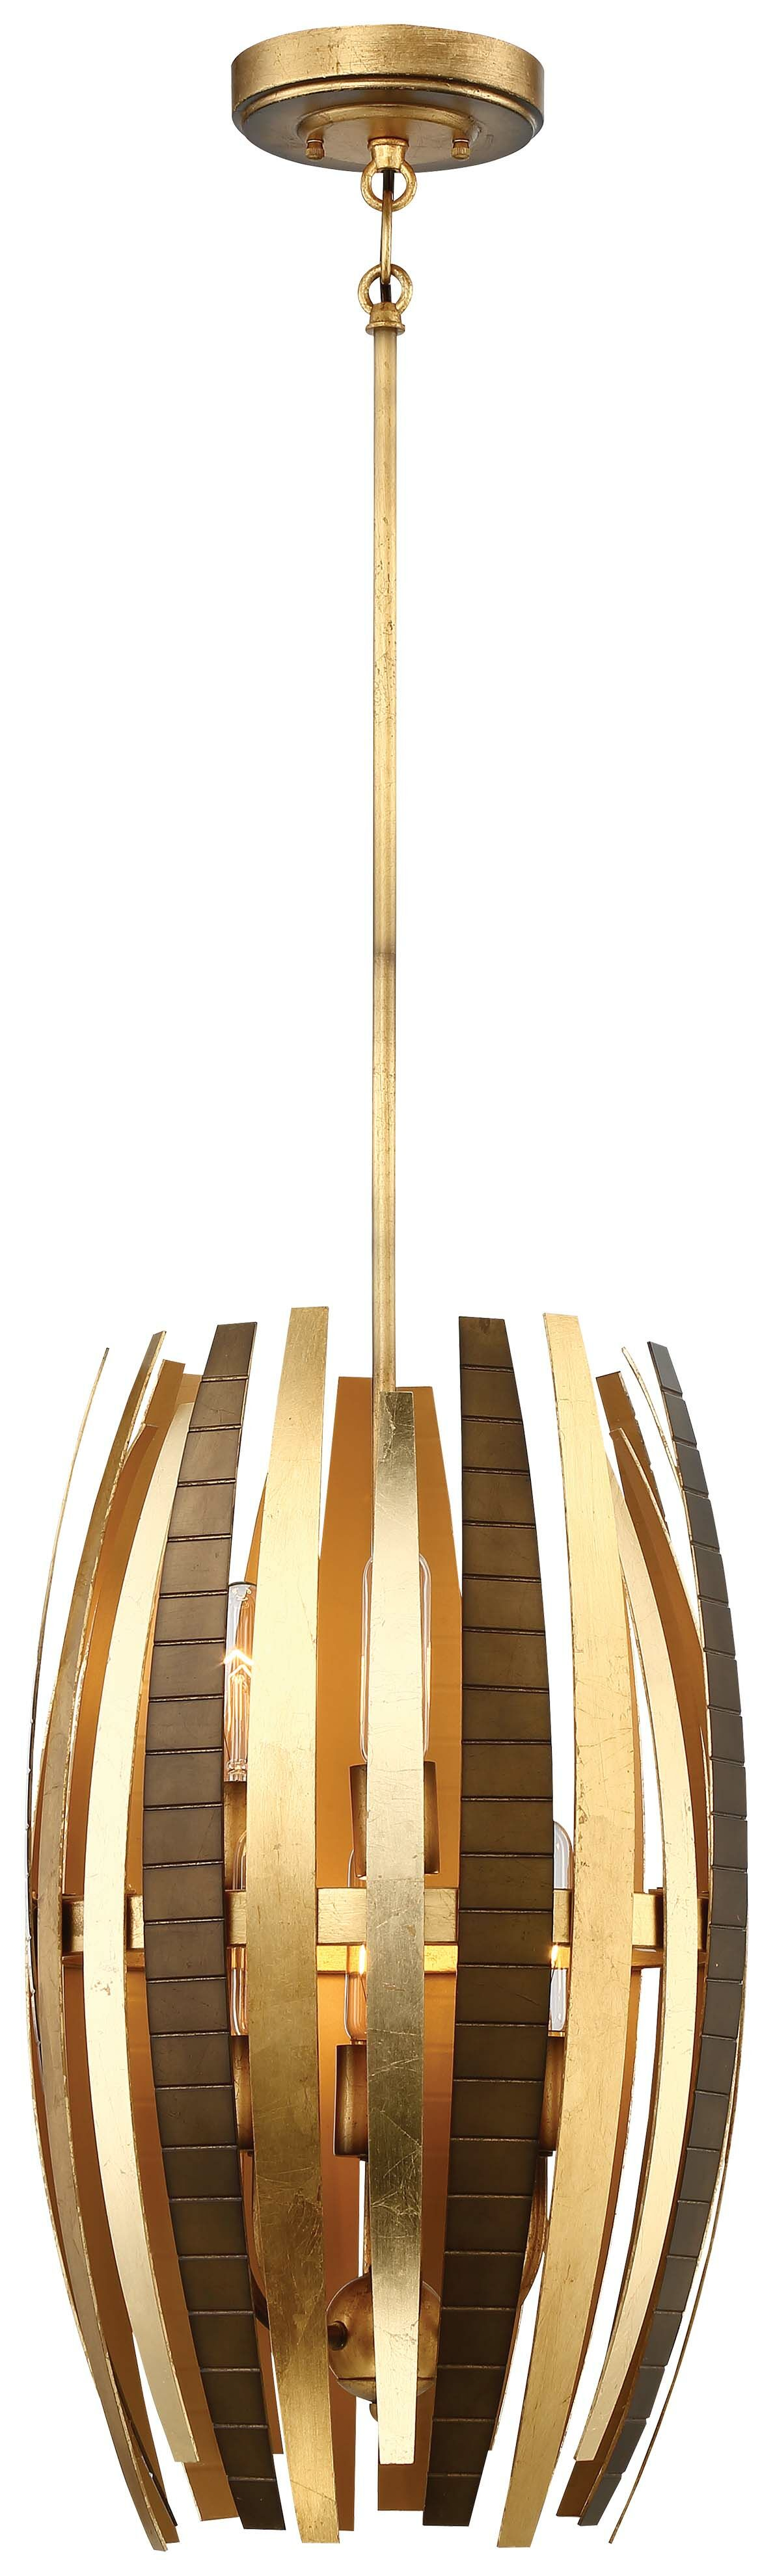 Manitou 6-Light Cylinder Pendant